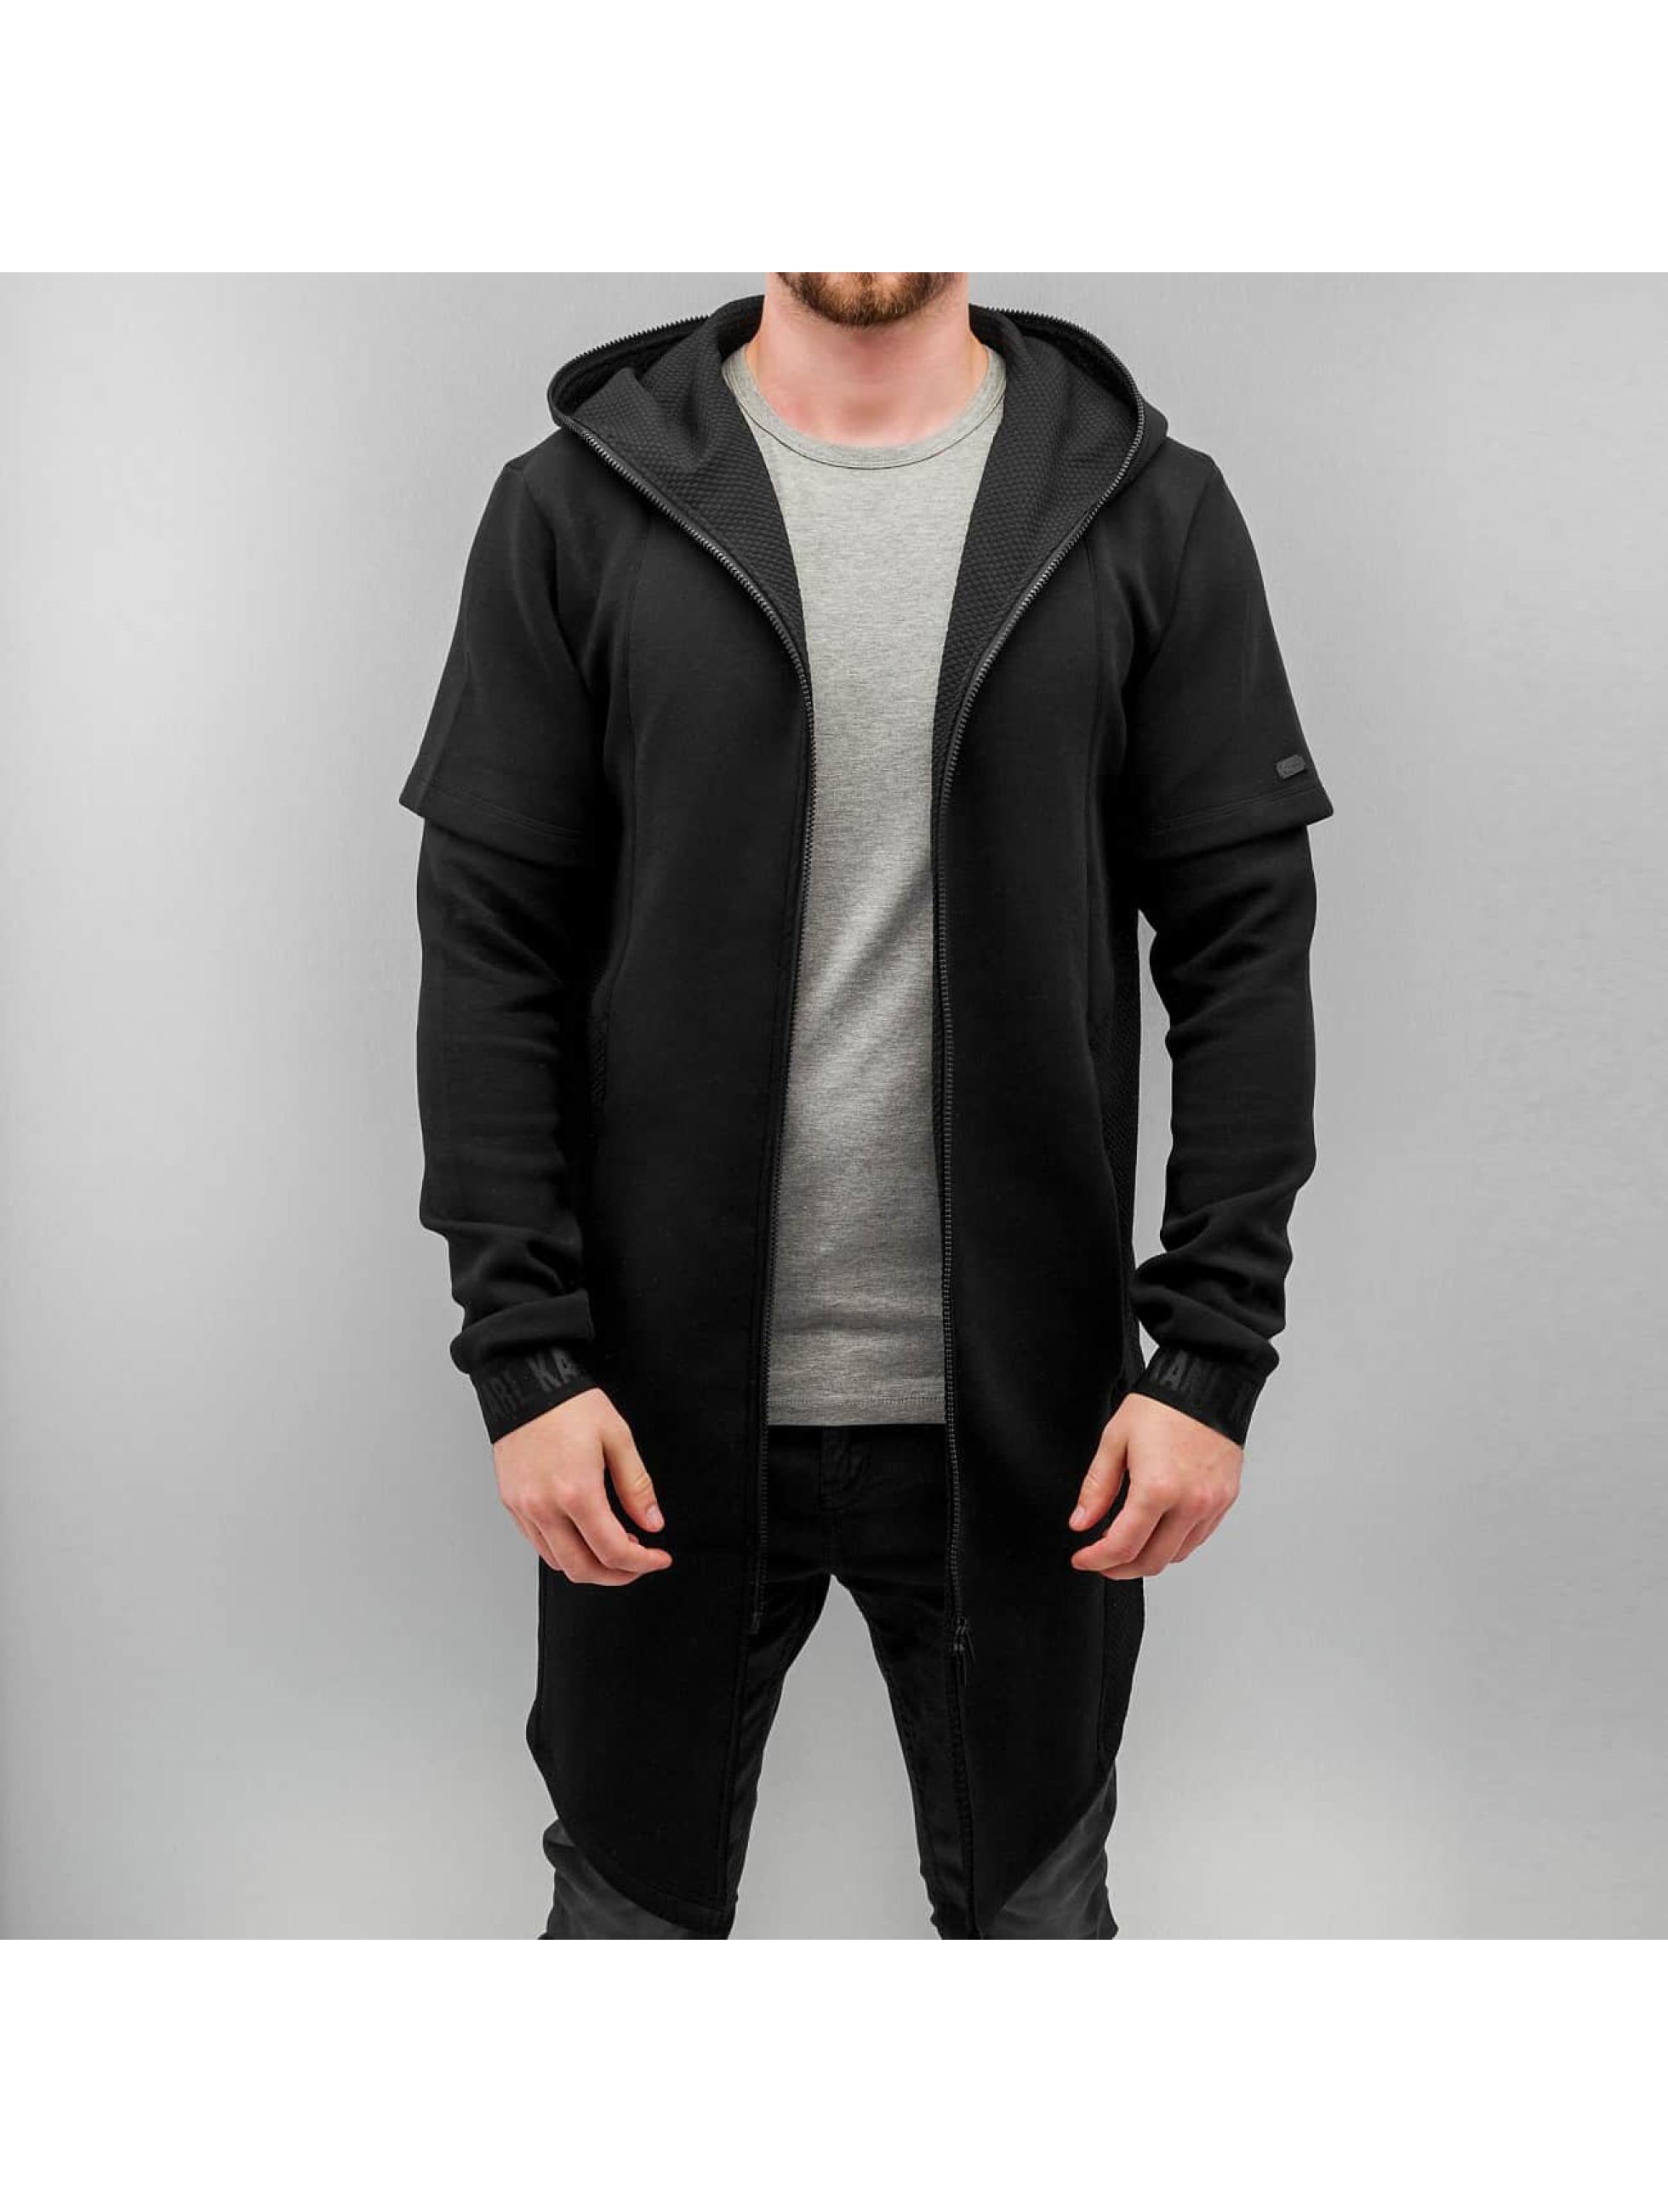 karl kani zip hoodie kkmaw1511 in schwarz 229151. Black Bedroom Furniture Sets. Home Design Ideas